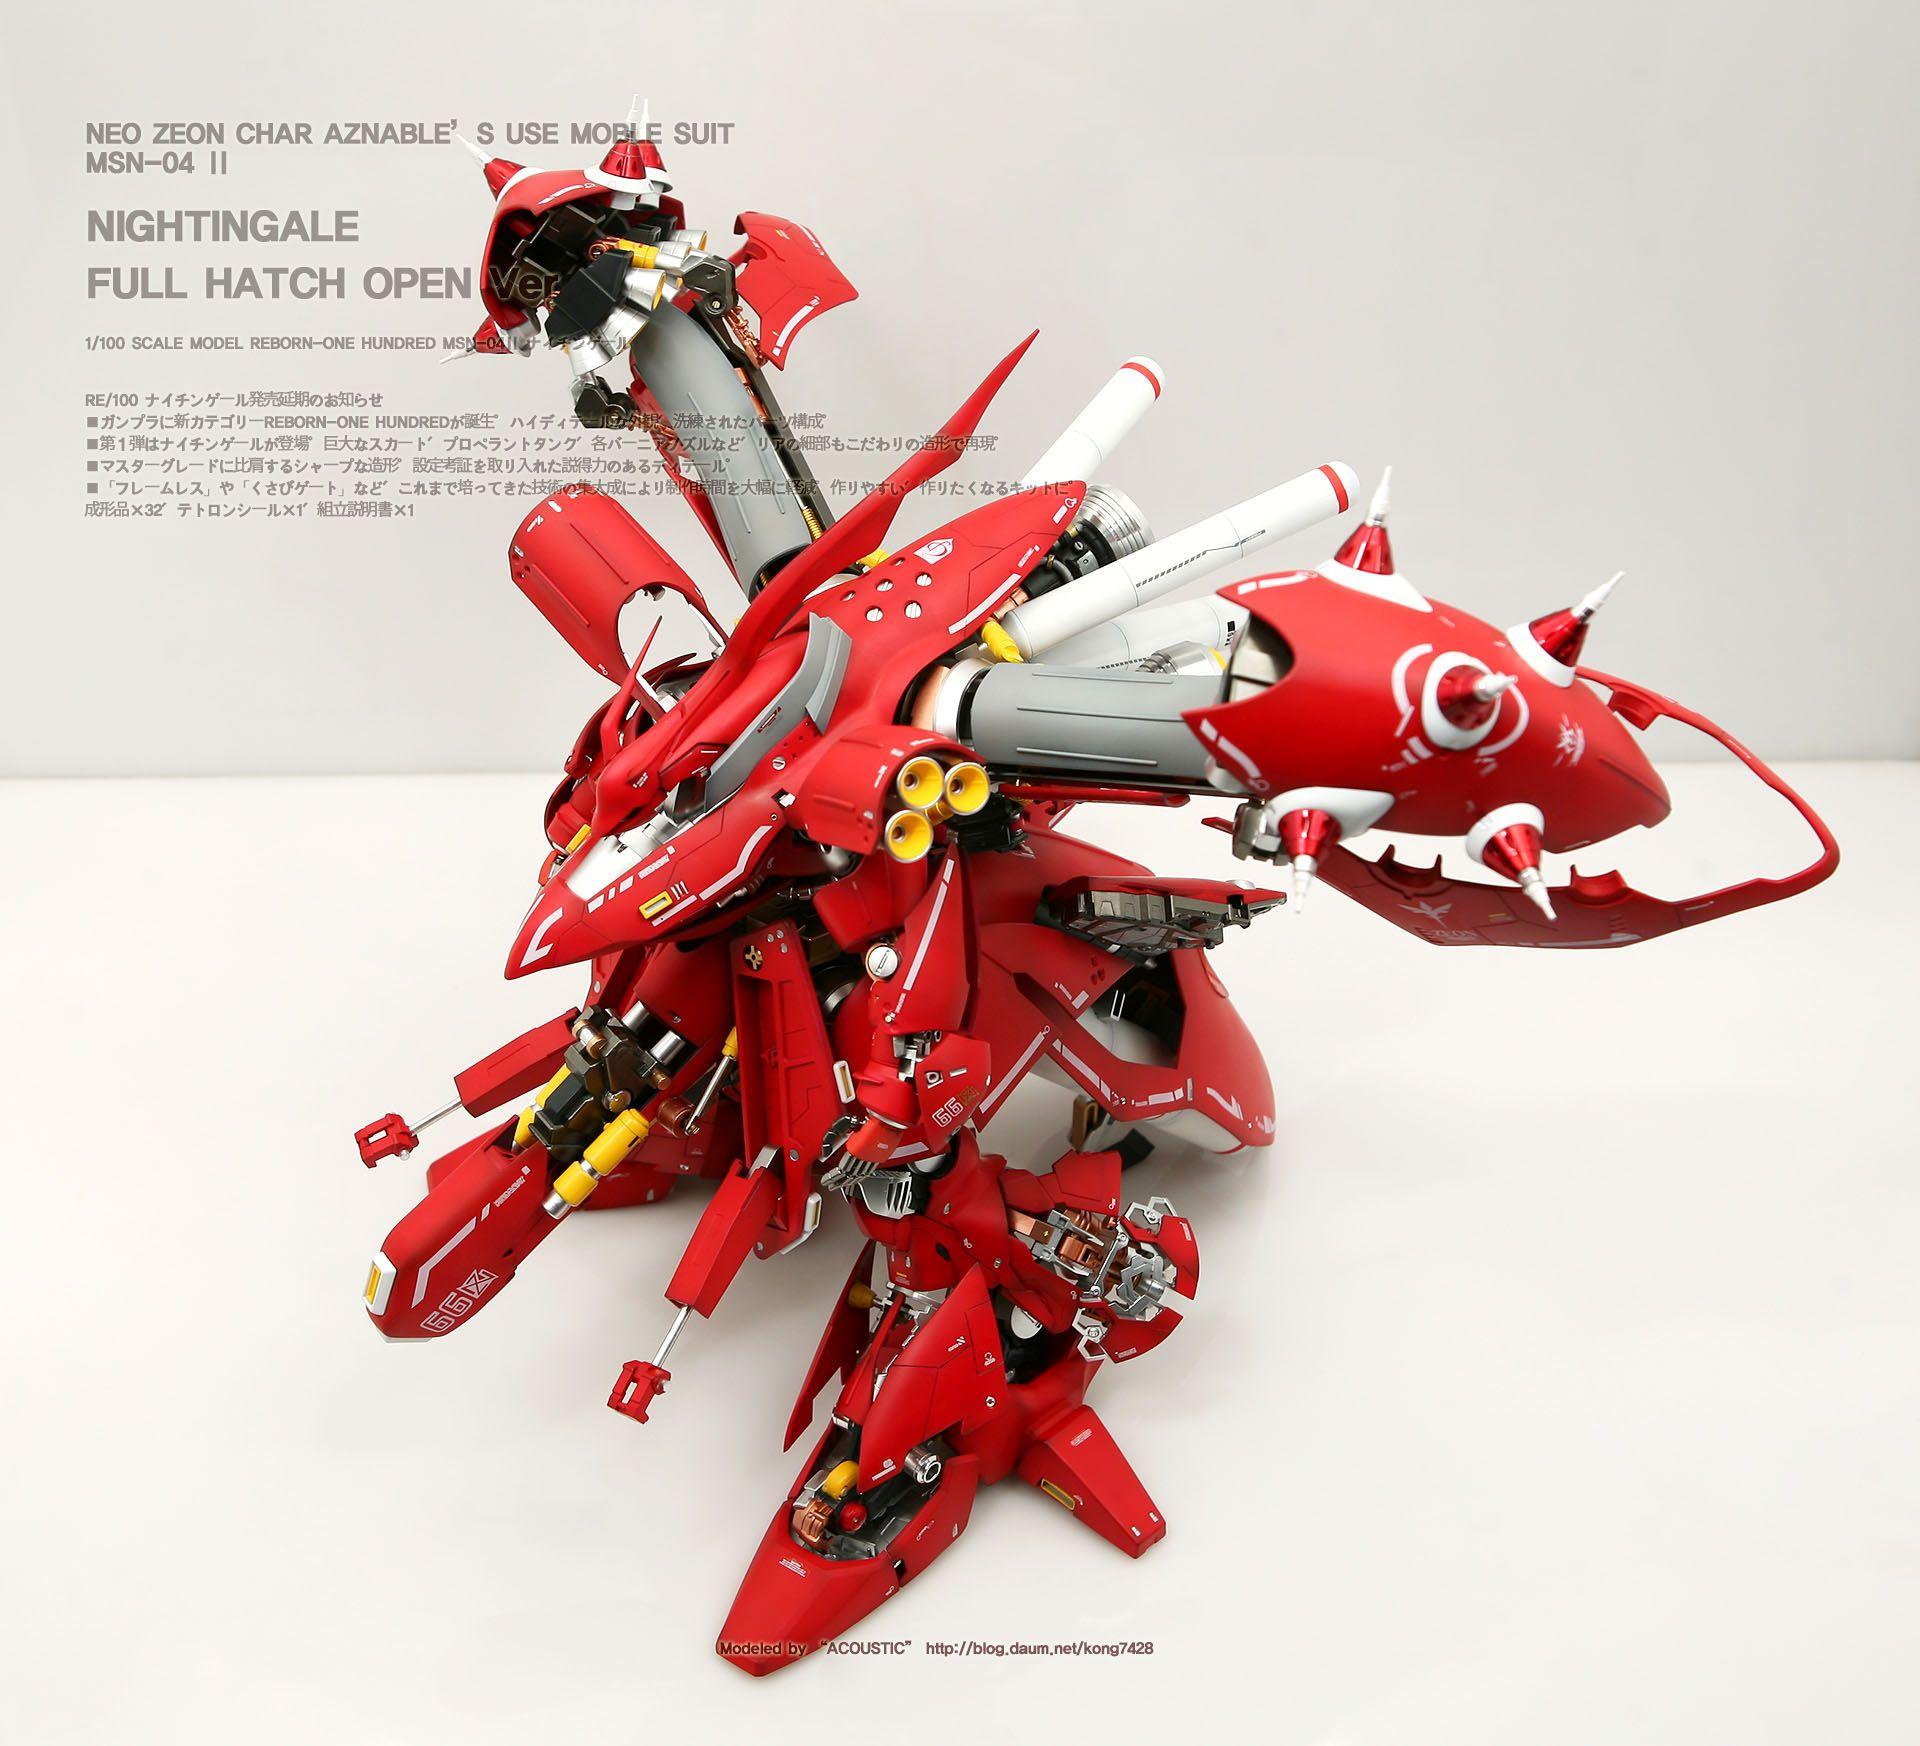 Custom Paint Shops Near Me >> Daum 블로그 - 이미지 원본보기   Gundam custom build, Gundam, Gundam model